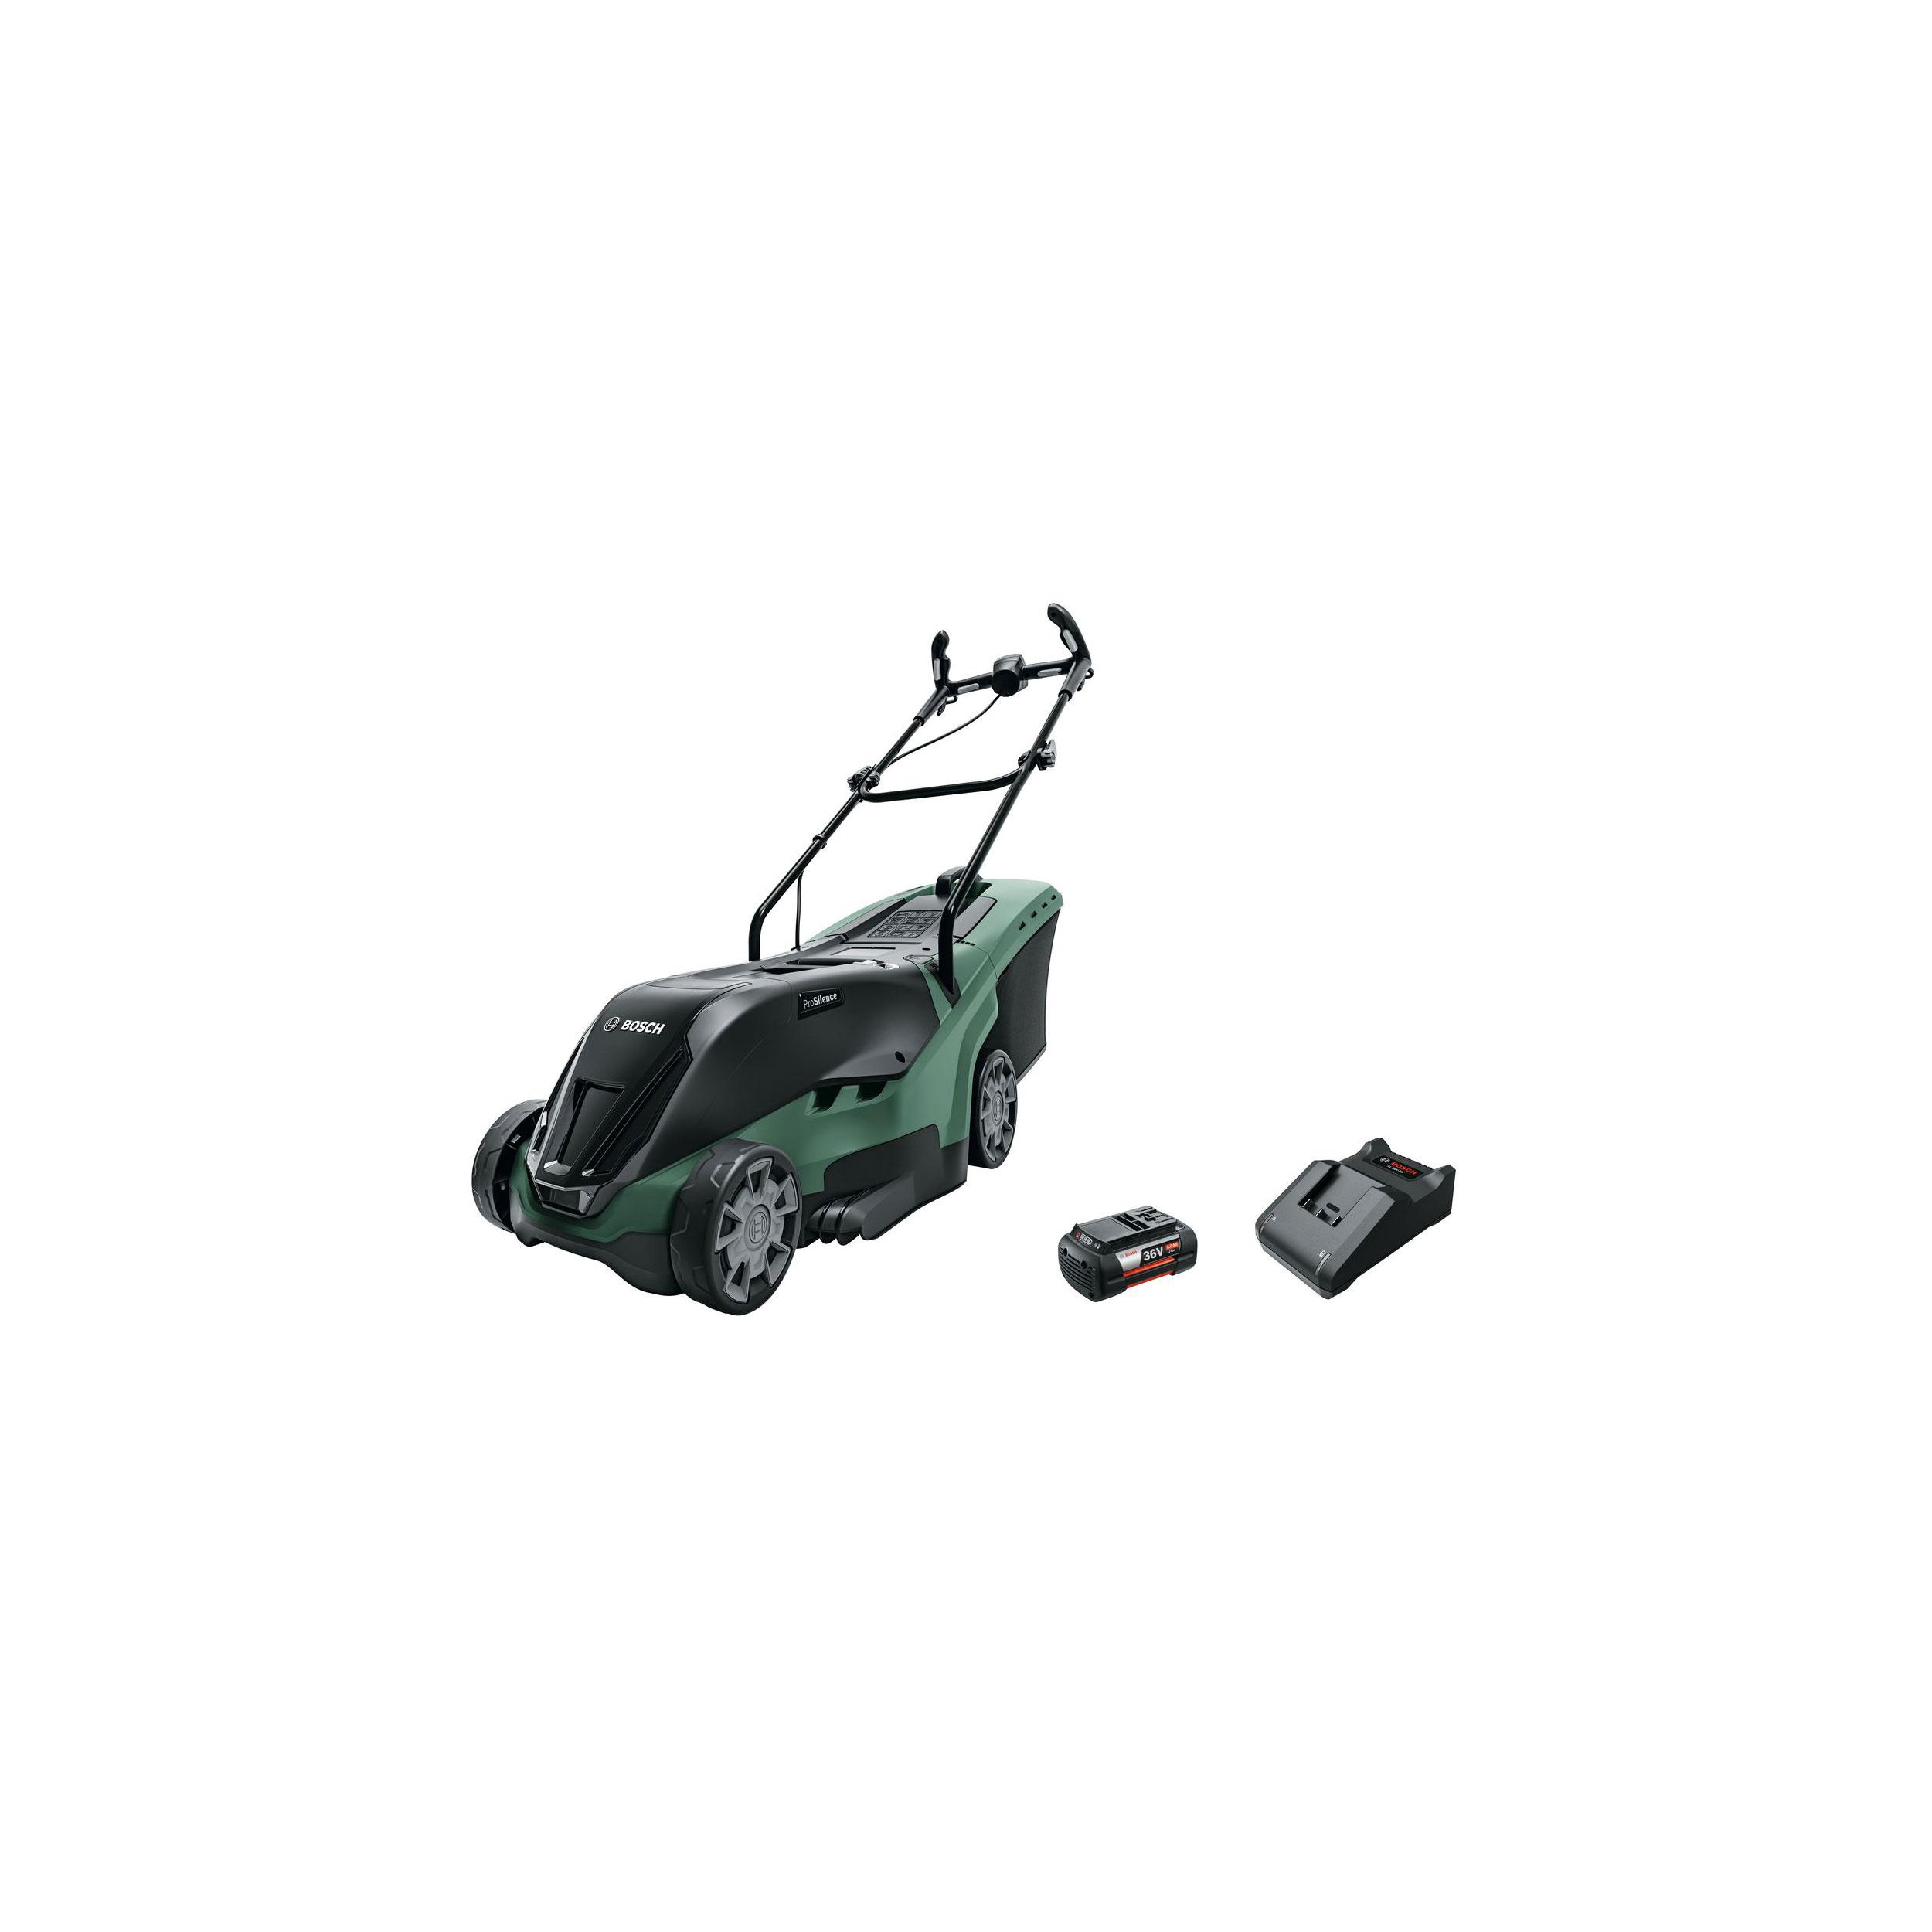 "Bosch Akku-Rasenmäher-Set ""Universal Rotak 36-550"", 3-teilig"